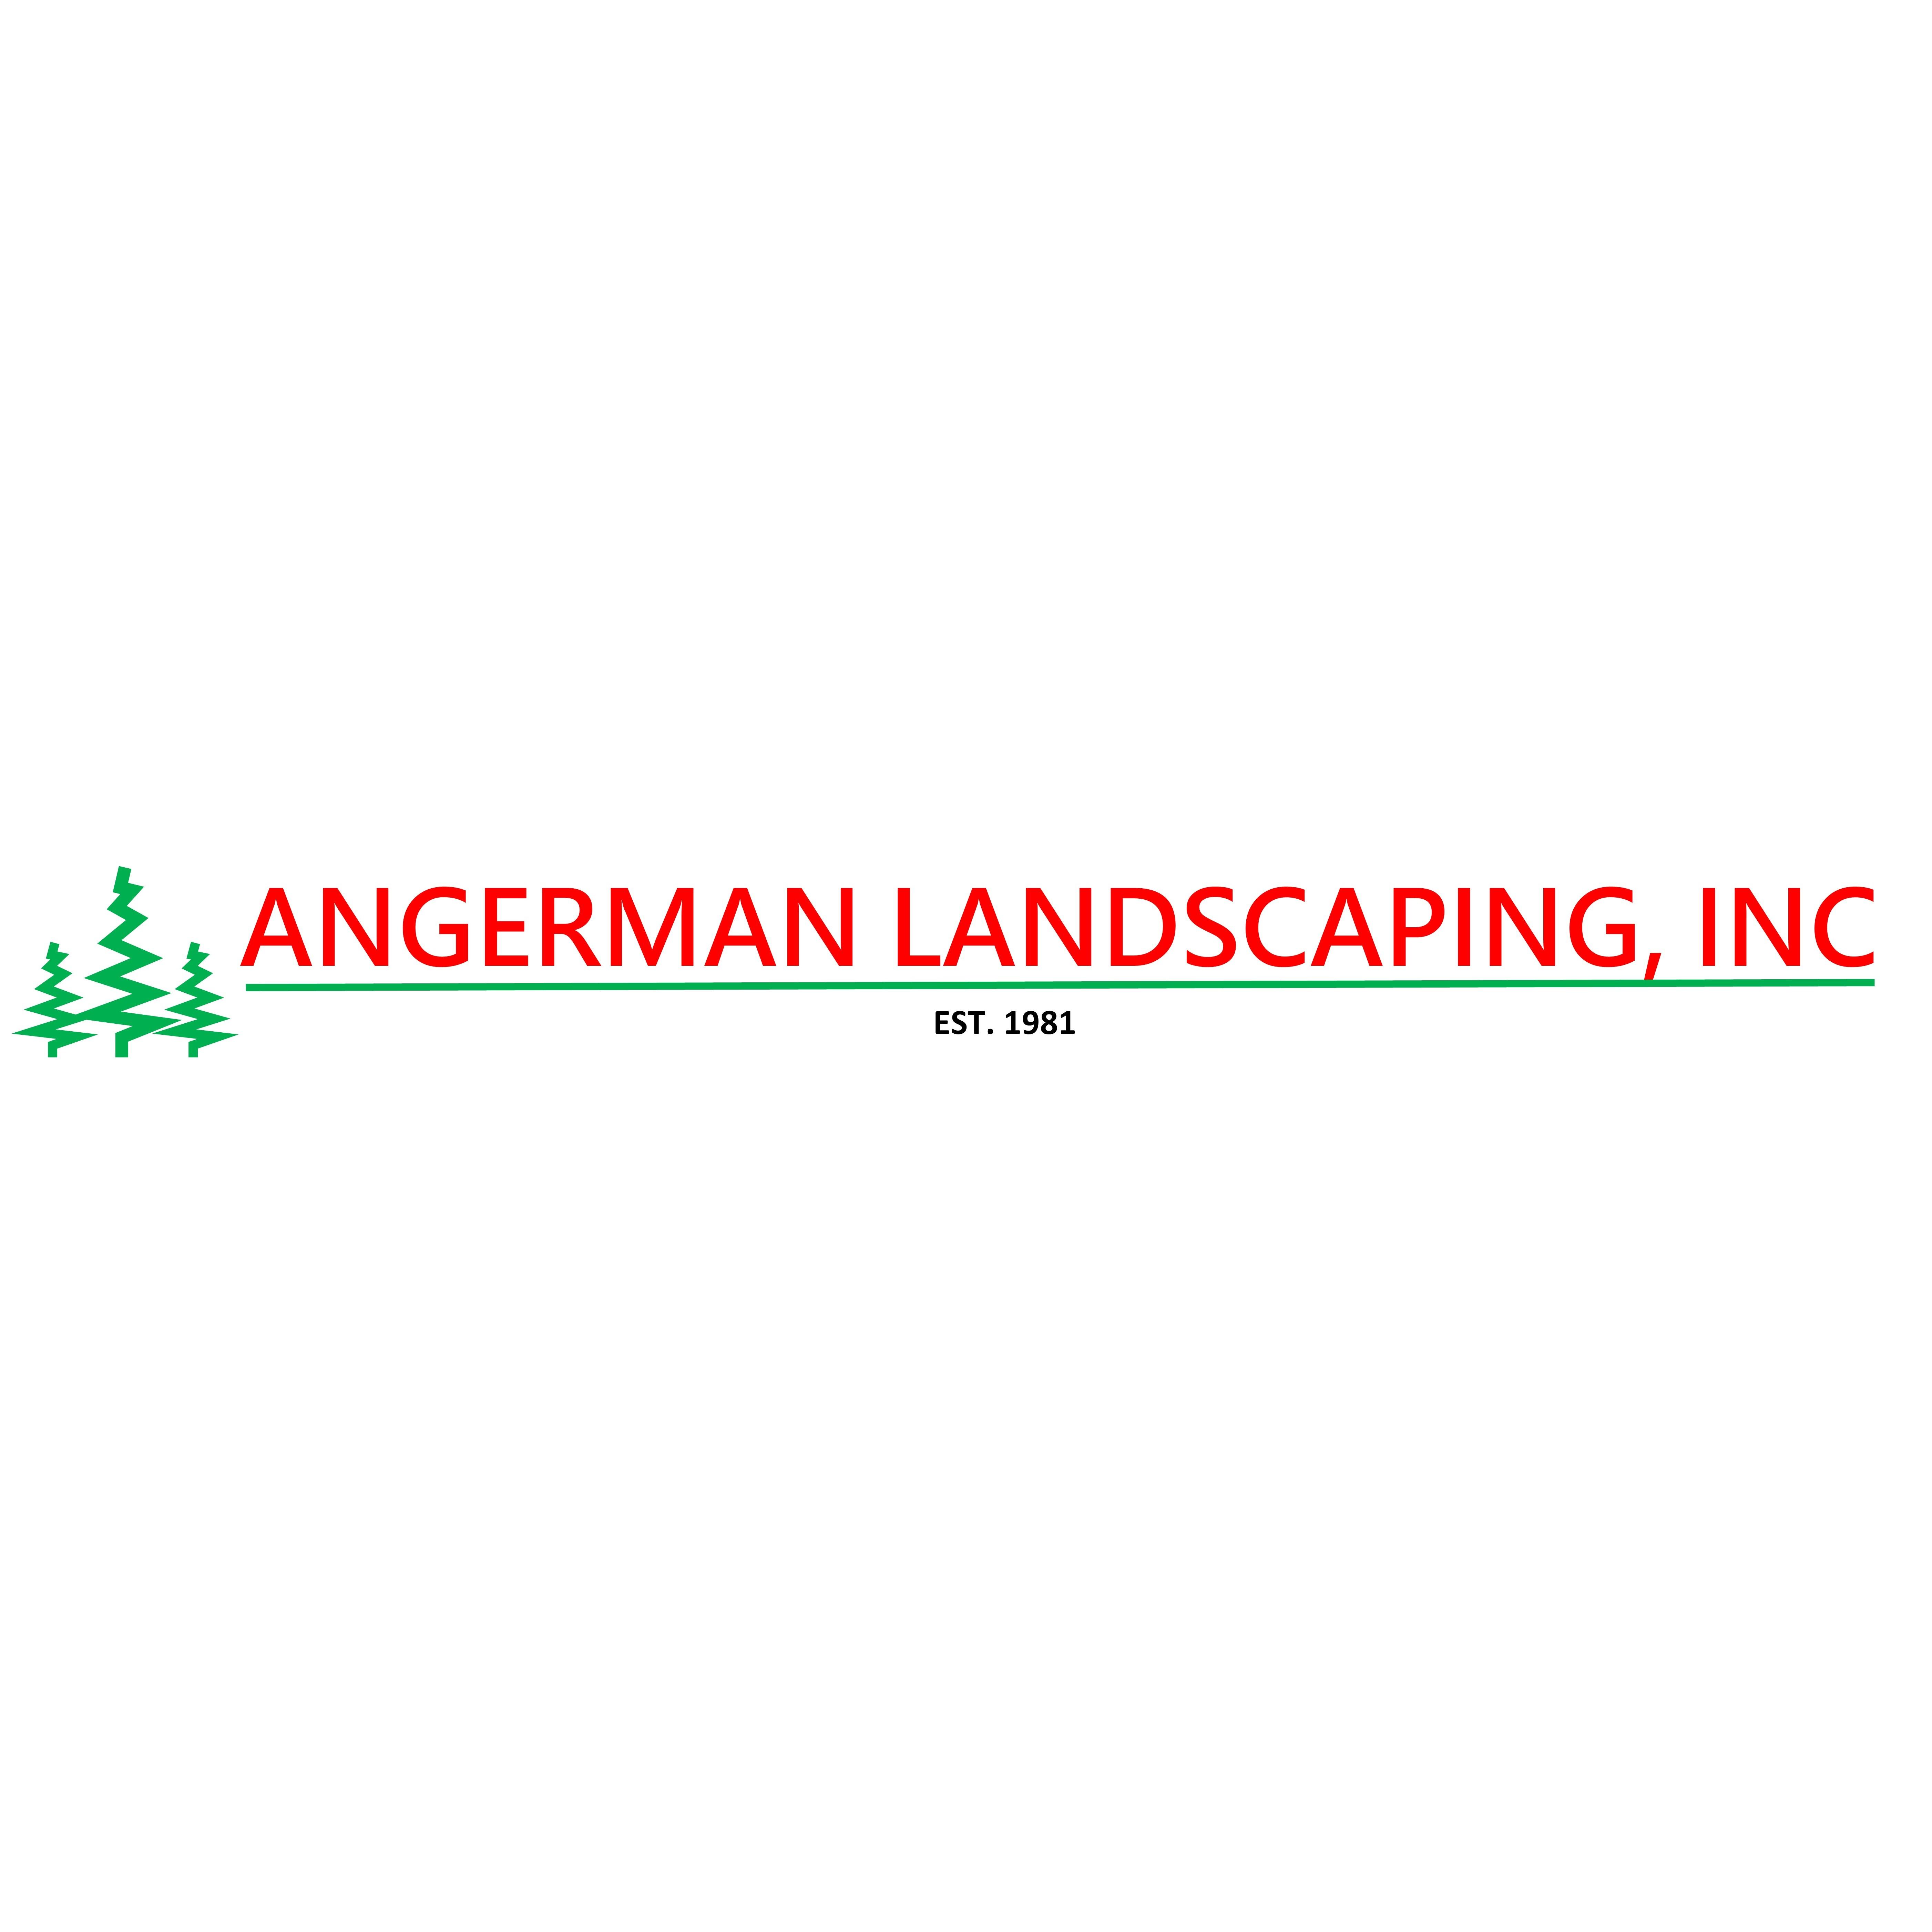 Angerman Landscaping Inc.